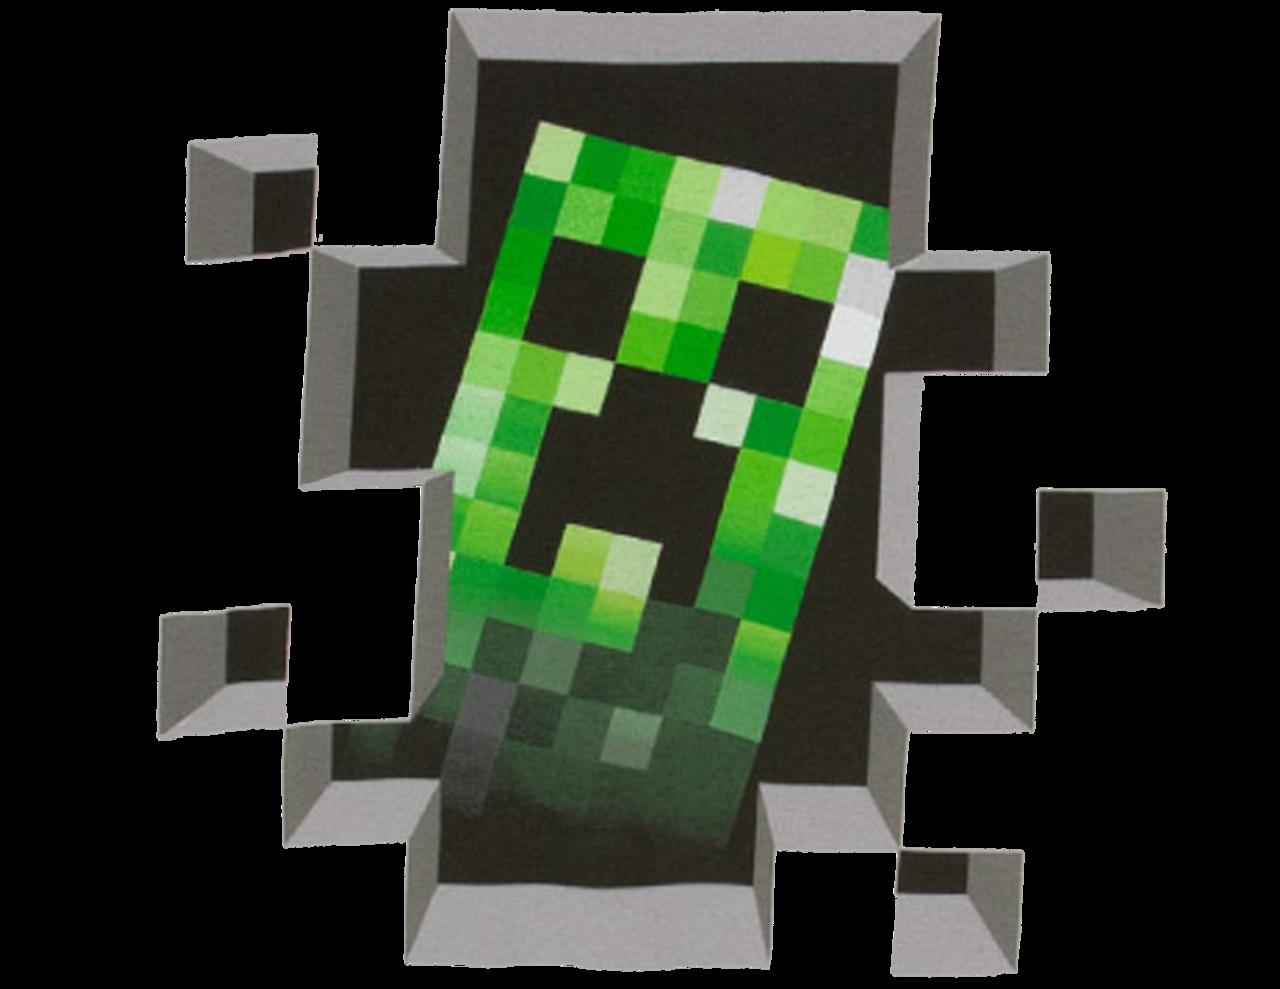 minecraft logo image #1006